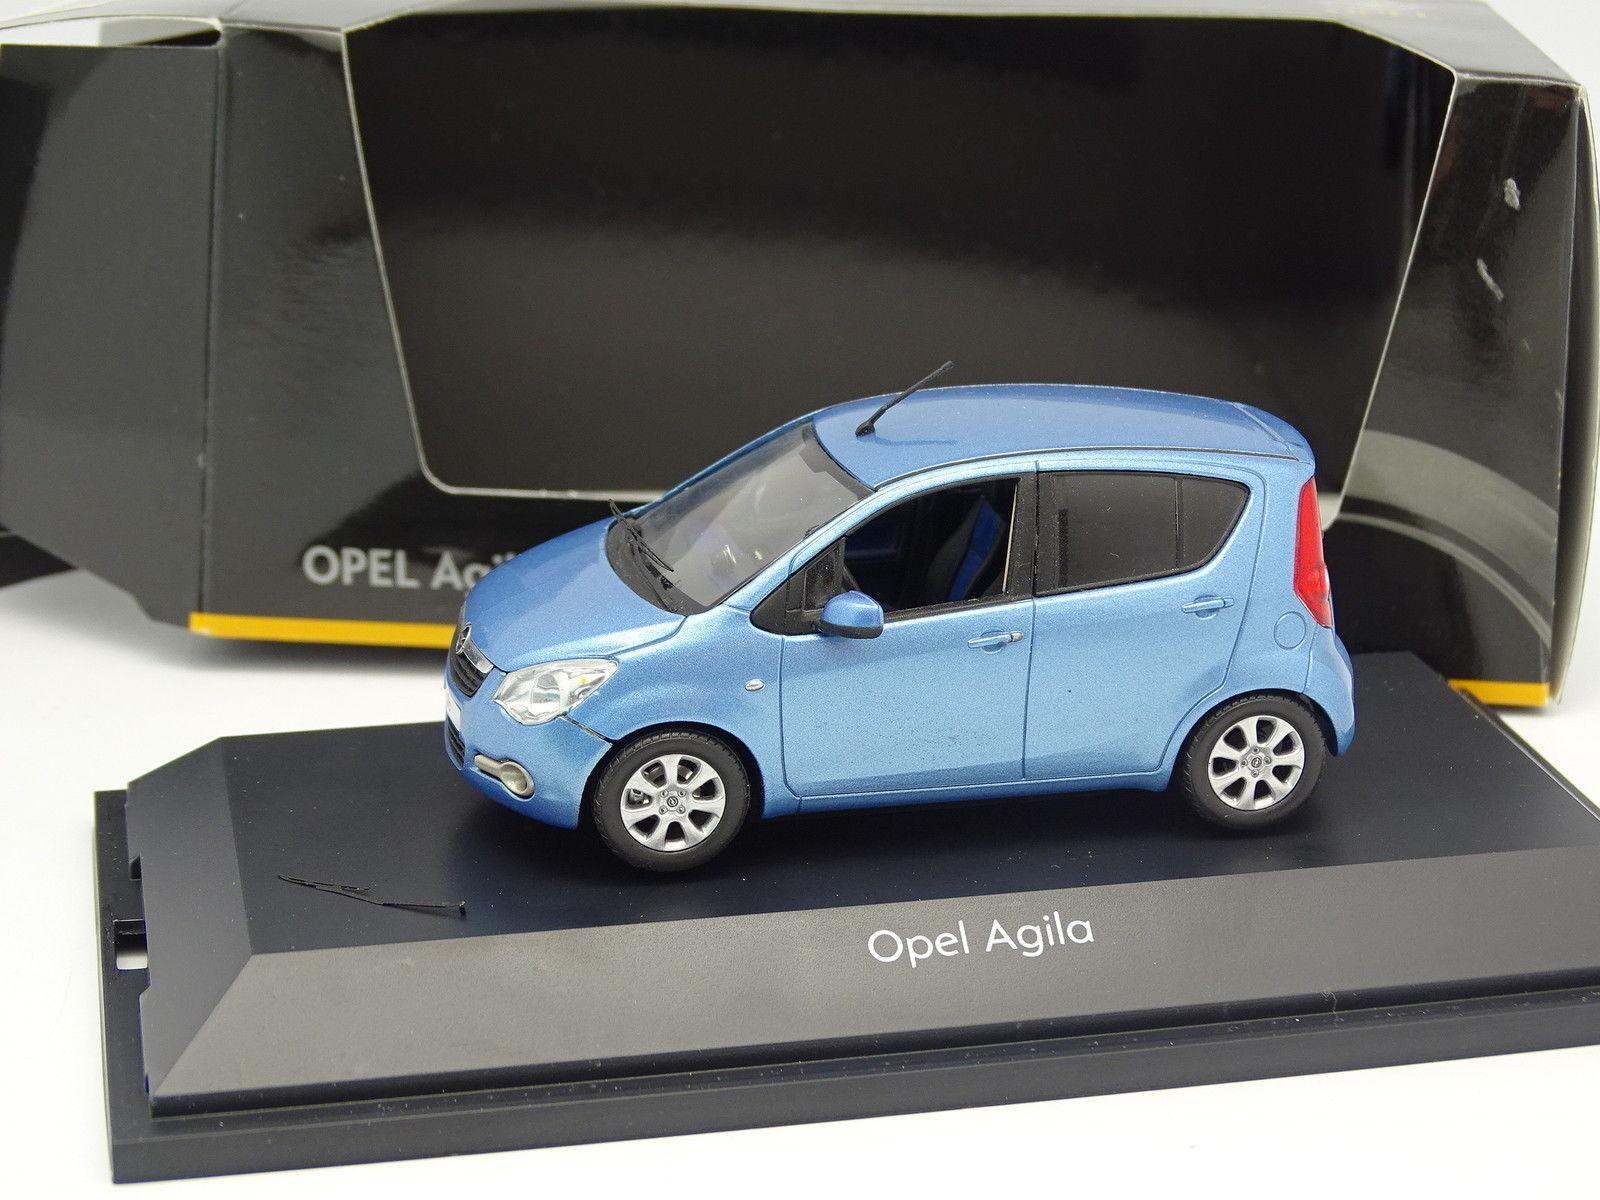 Schuco 1 43 - Opel Agila bluee bluee bluee 5189a2